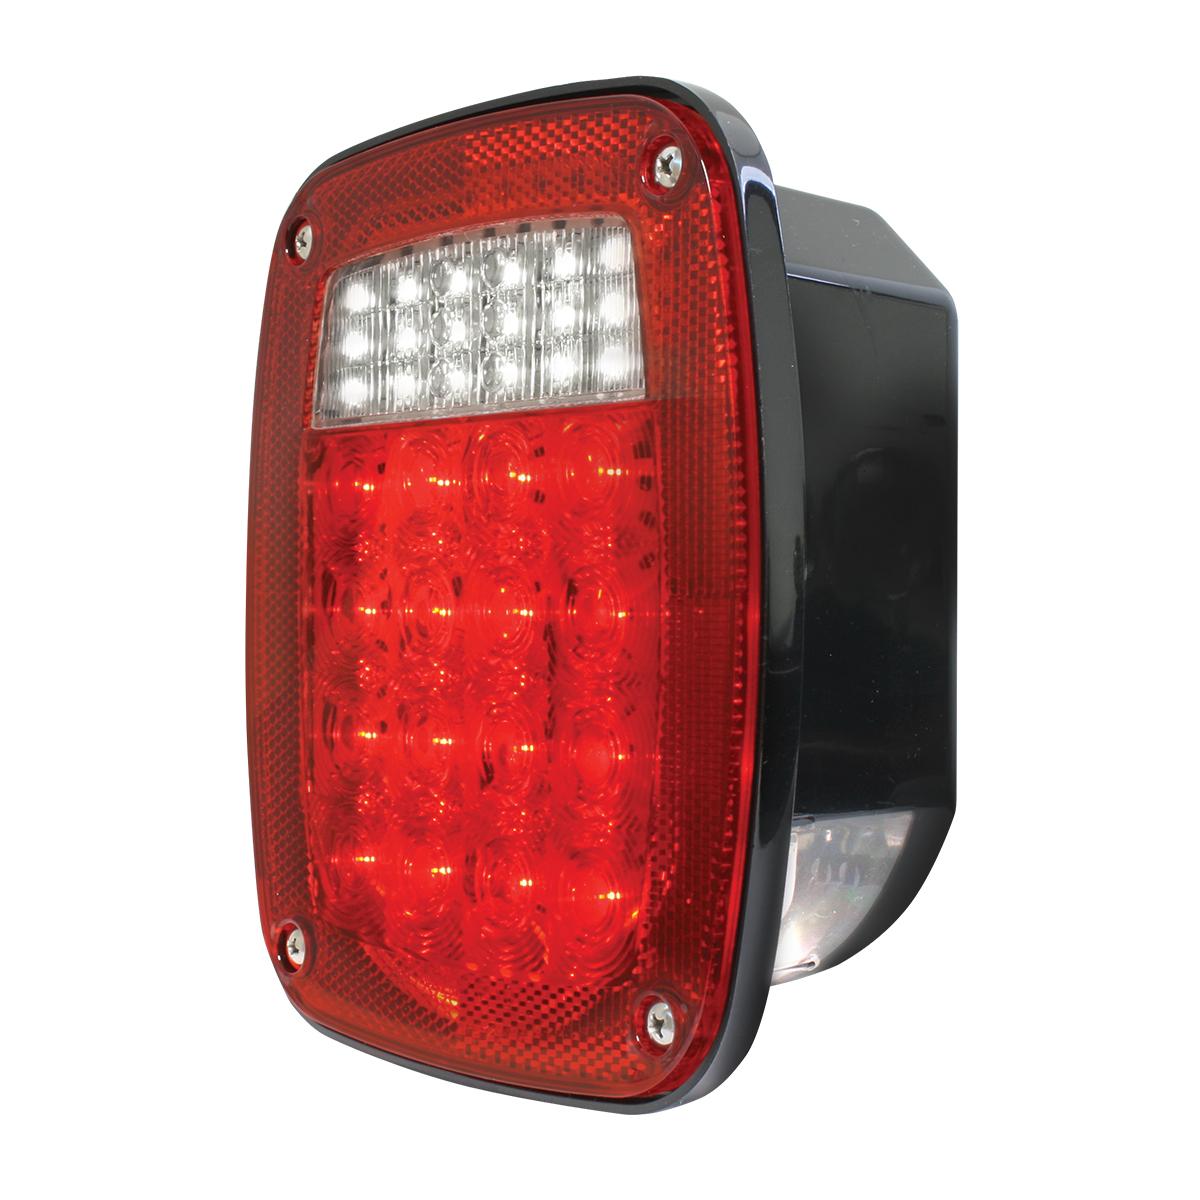 80795 Multi-Function Combination LED Light w/ License Light